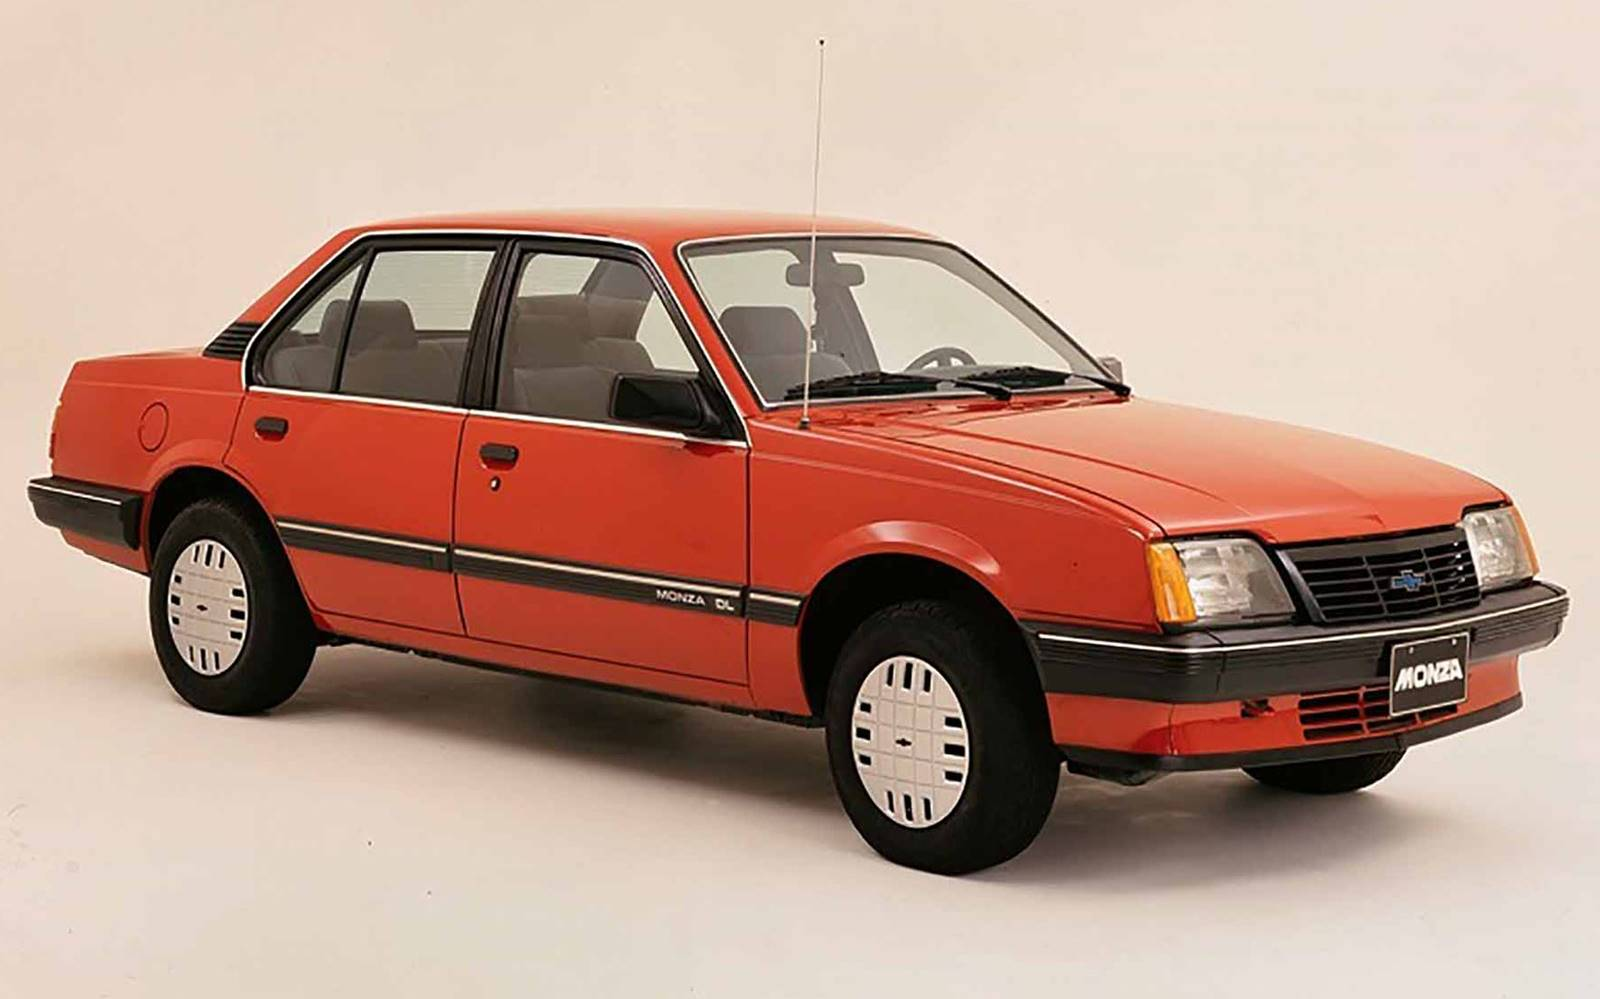 O modelo foi fabricado no Brasil de abril de 1982, a agosto de 1996.